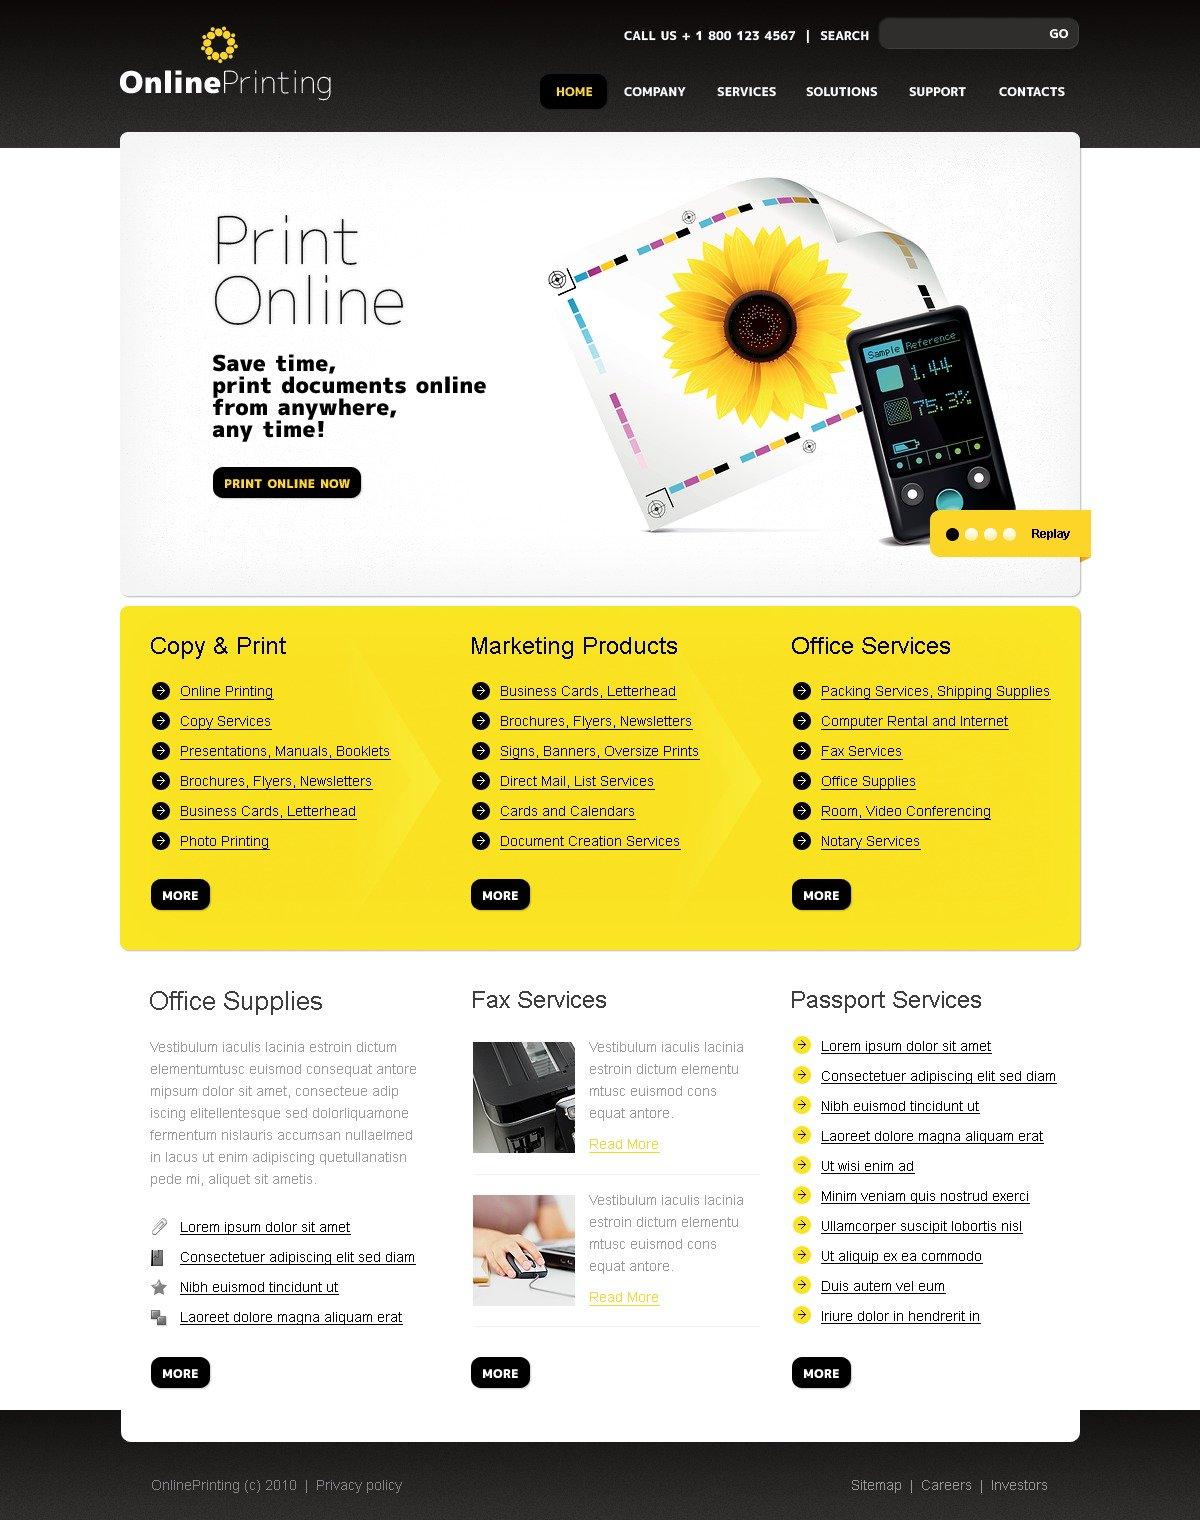 print shop website template 29903 by wt website templates. Black Bedroom Furniture Sets. Home Design Ideas